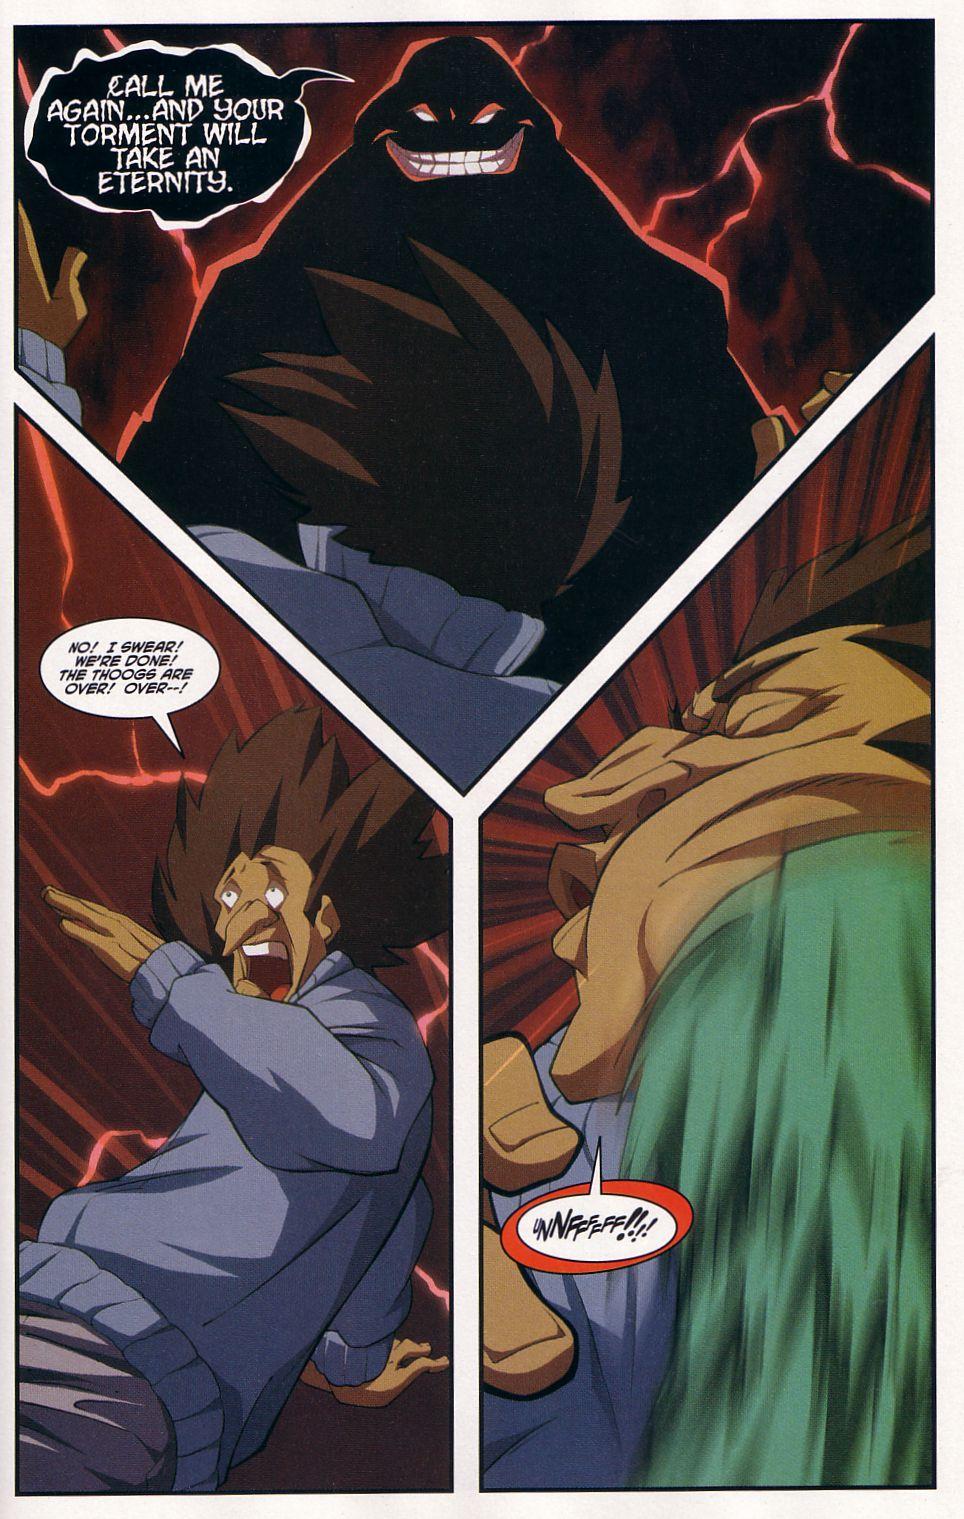 Teenage Mutant Ninja Turtles (2003) chap 7 pic 23